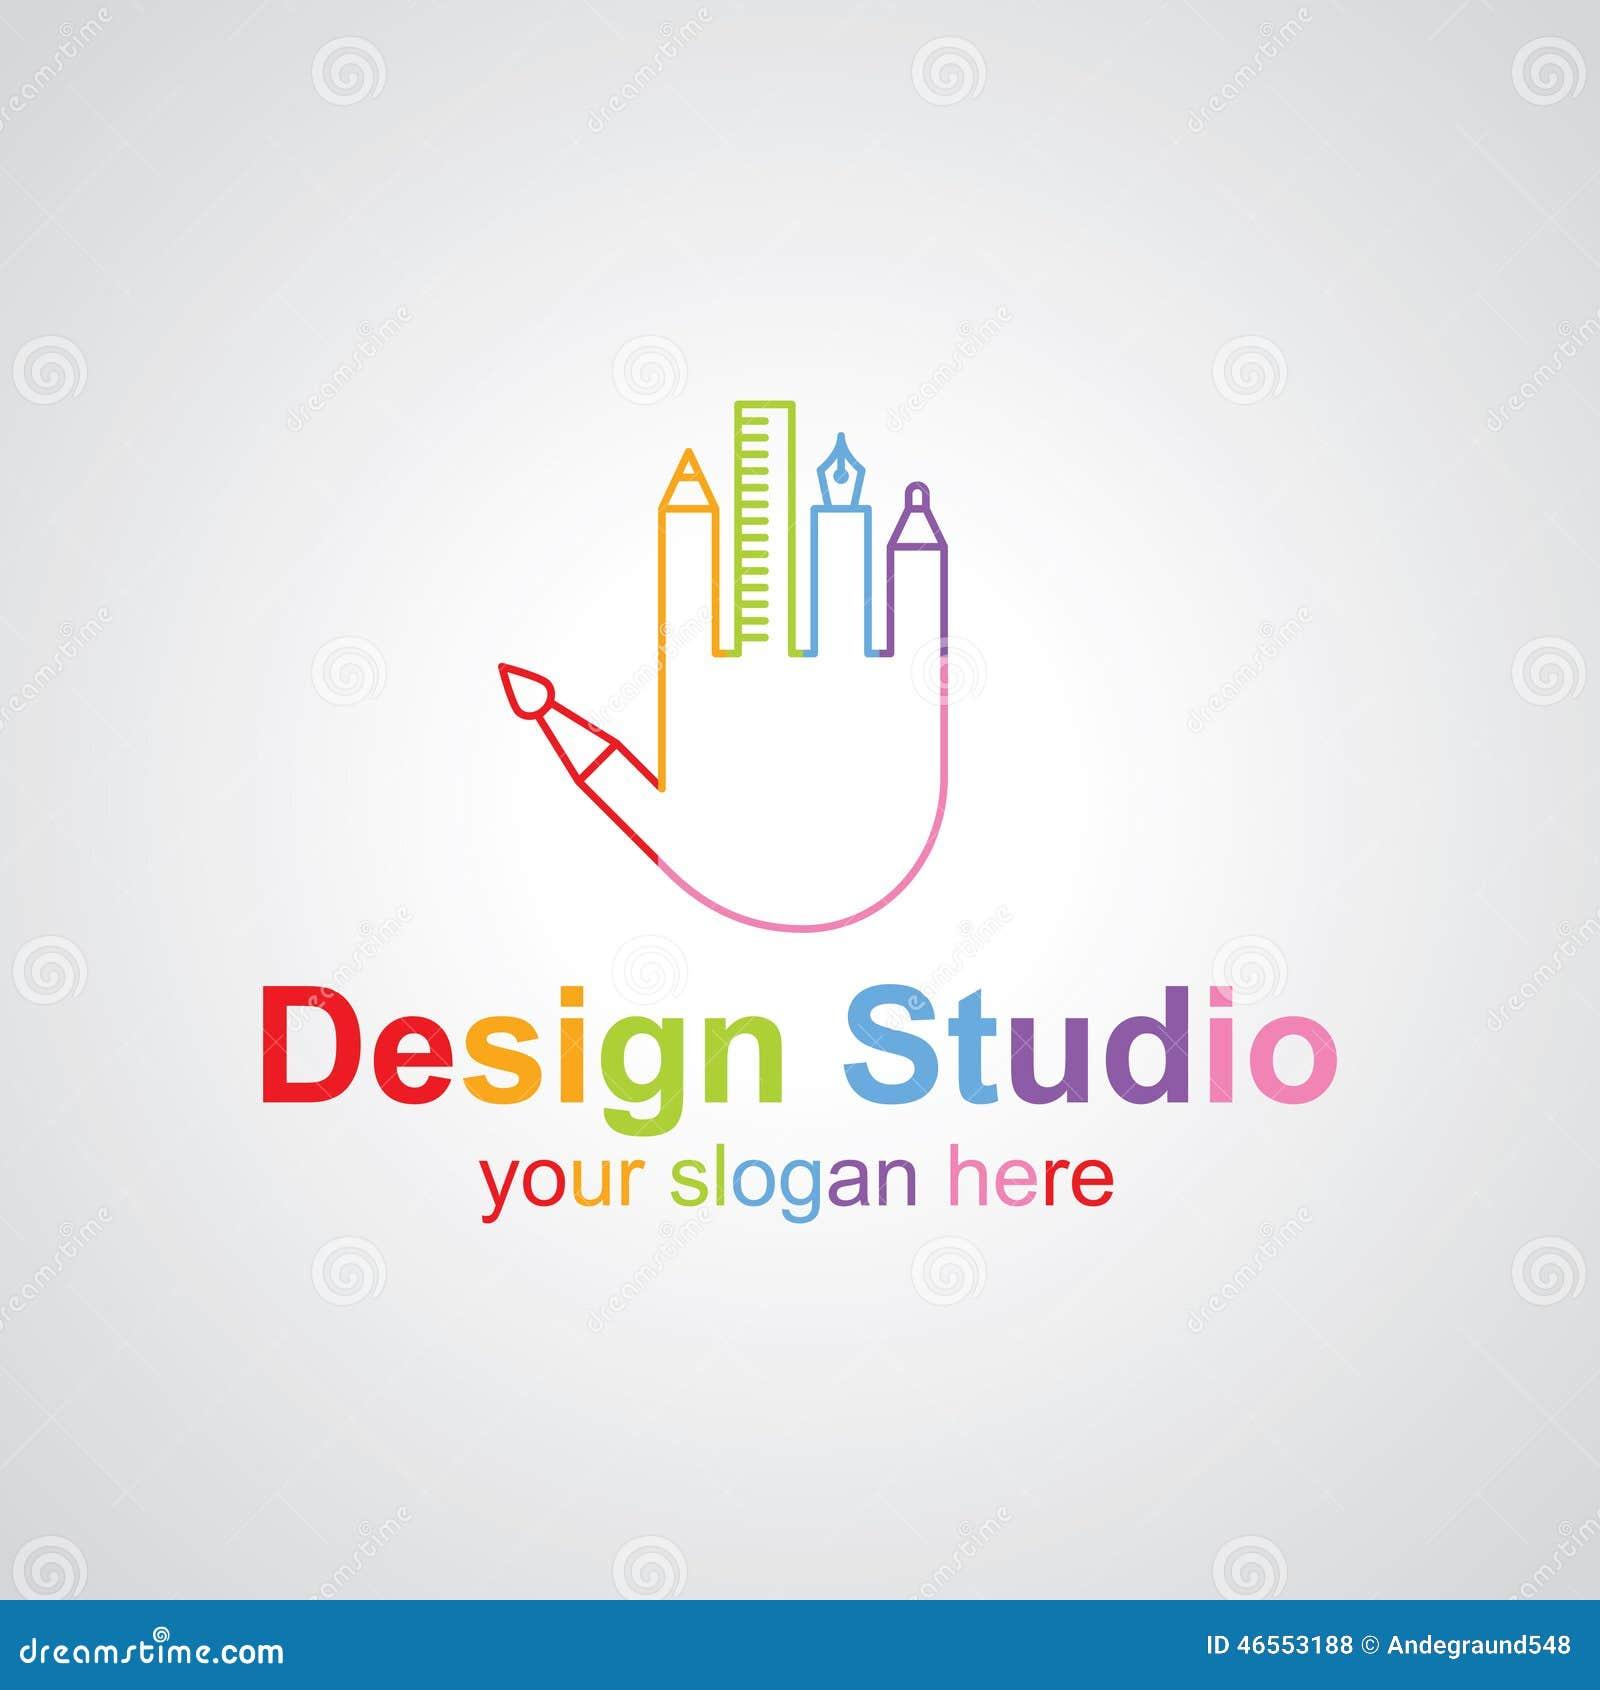 Design Studio Vector Logo Design Stock Vector Image